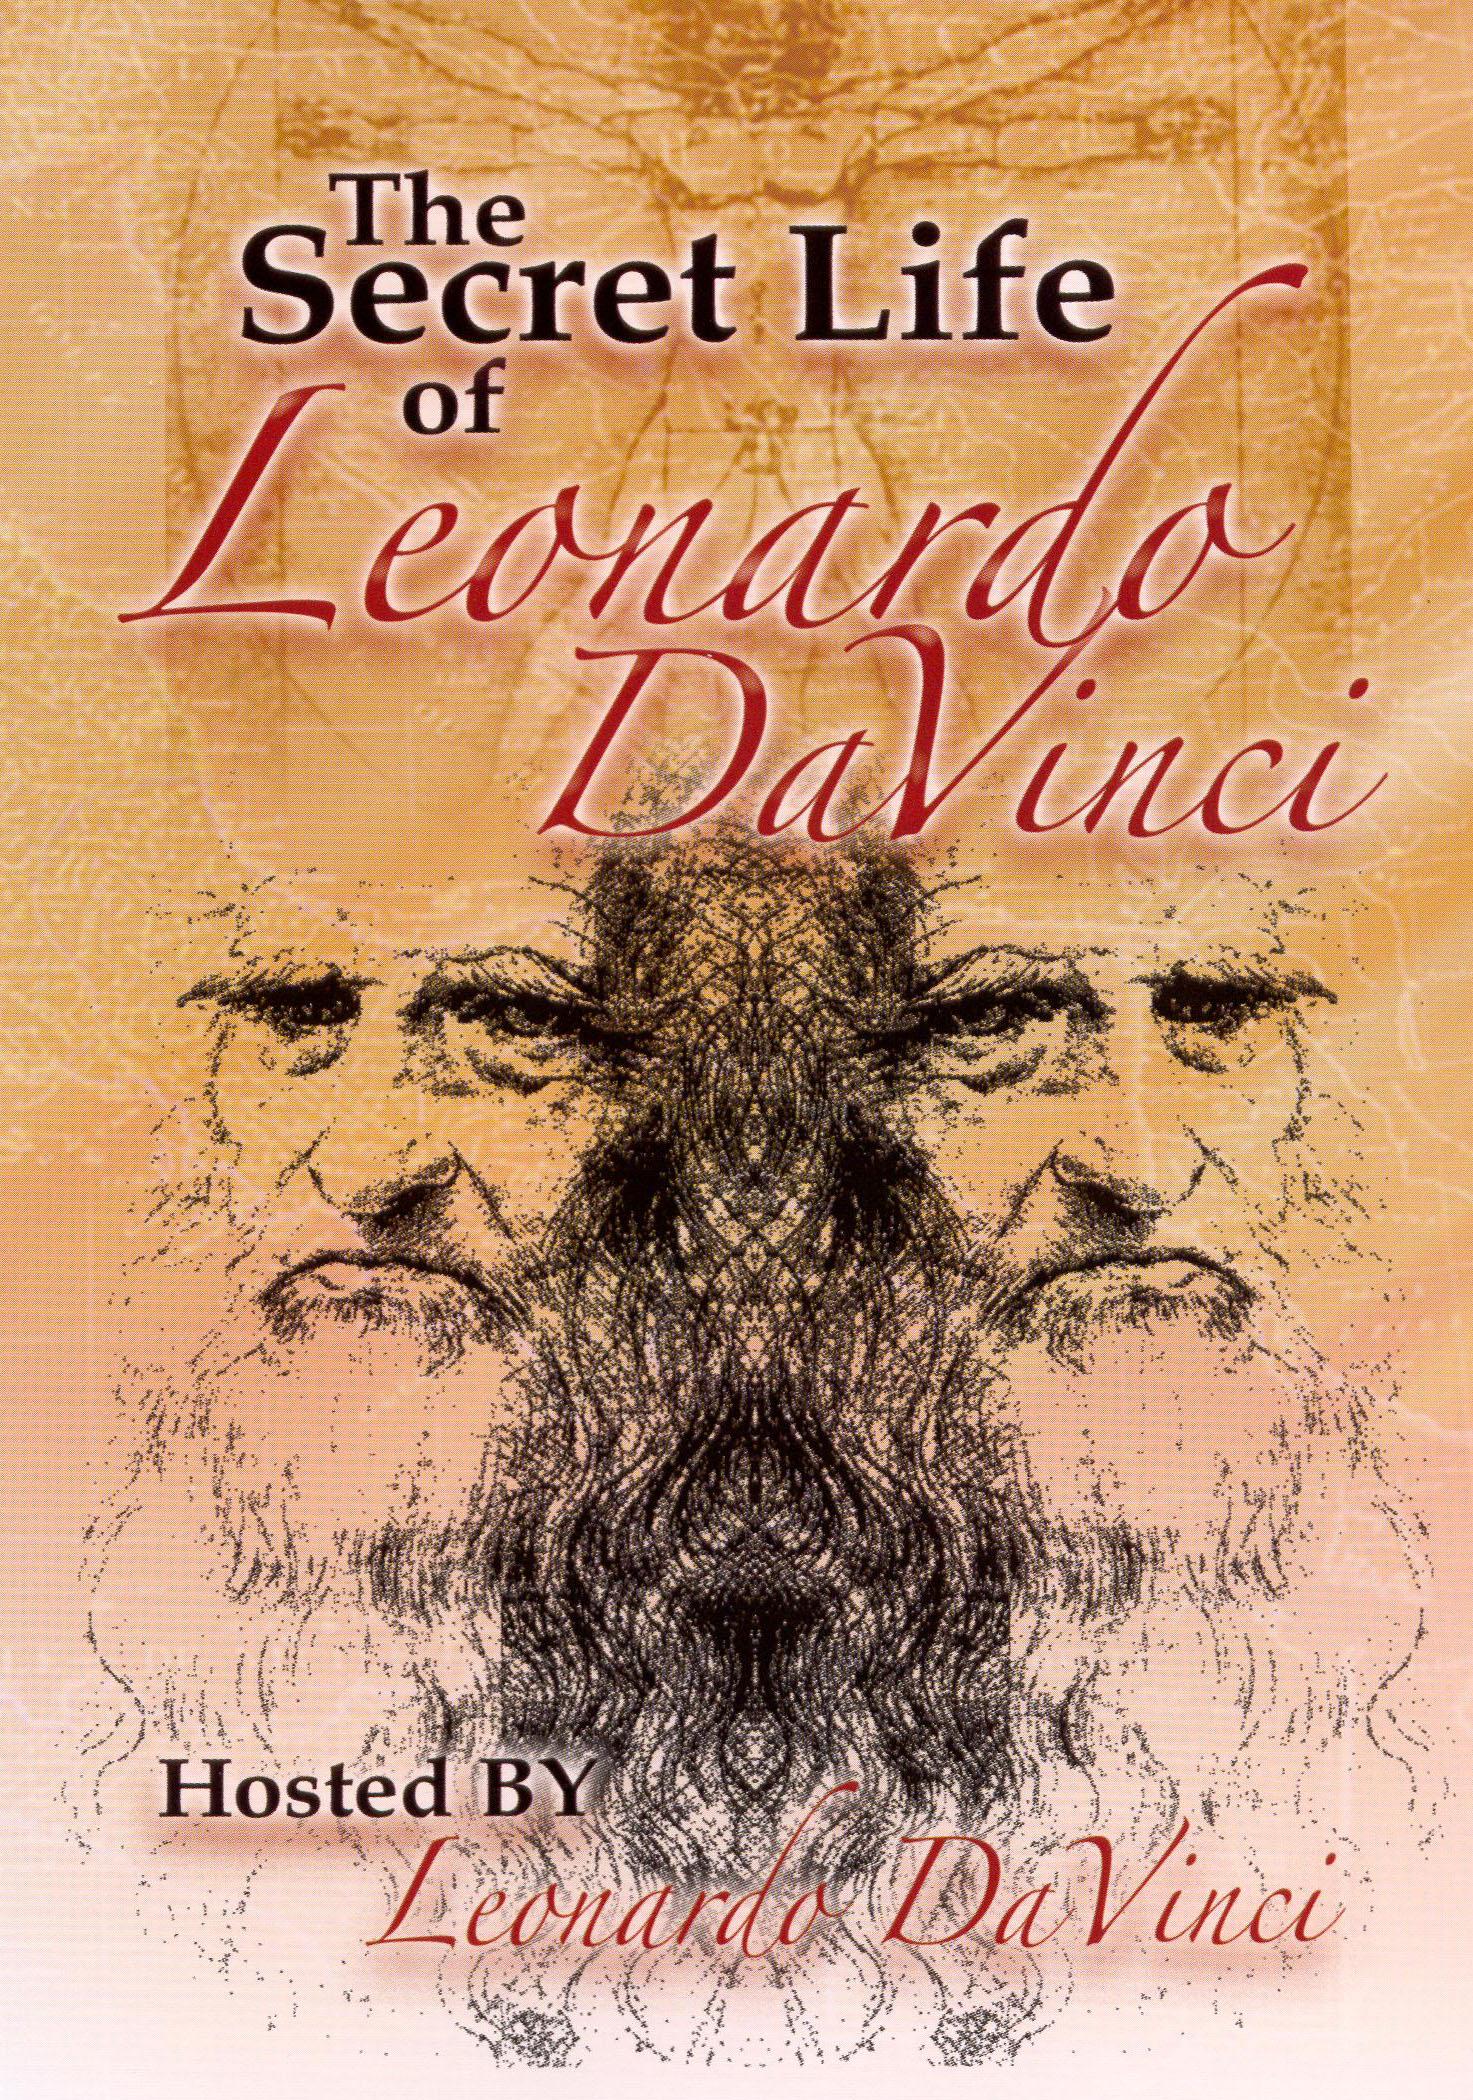 The Secret Life of Leonardo Davinci